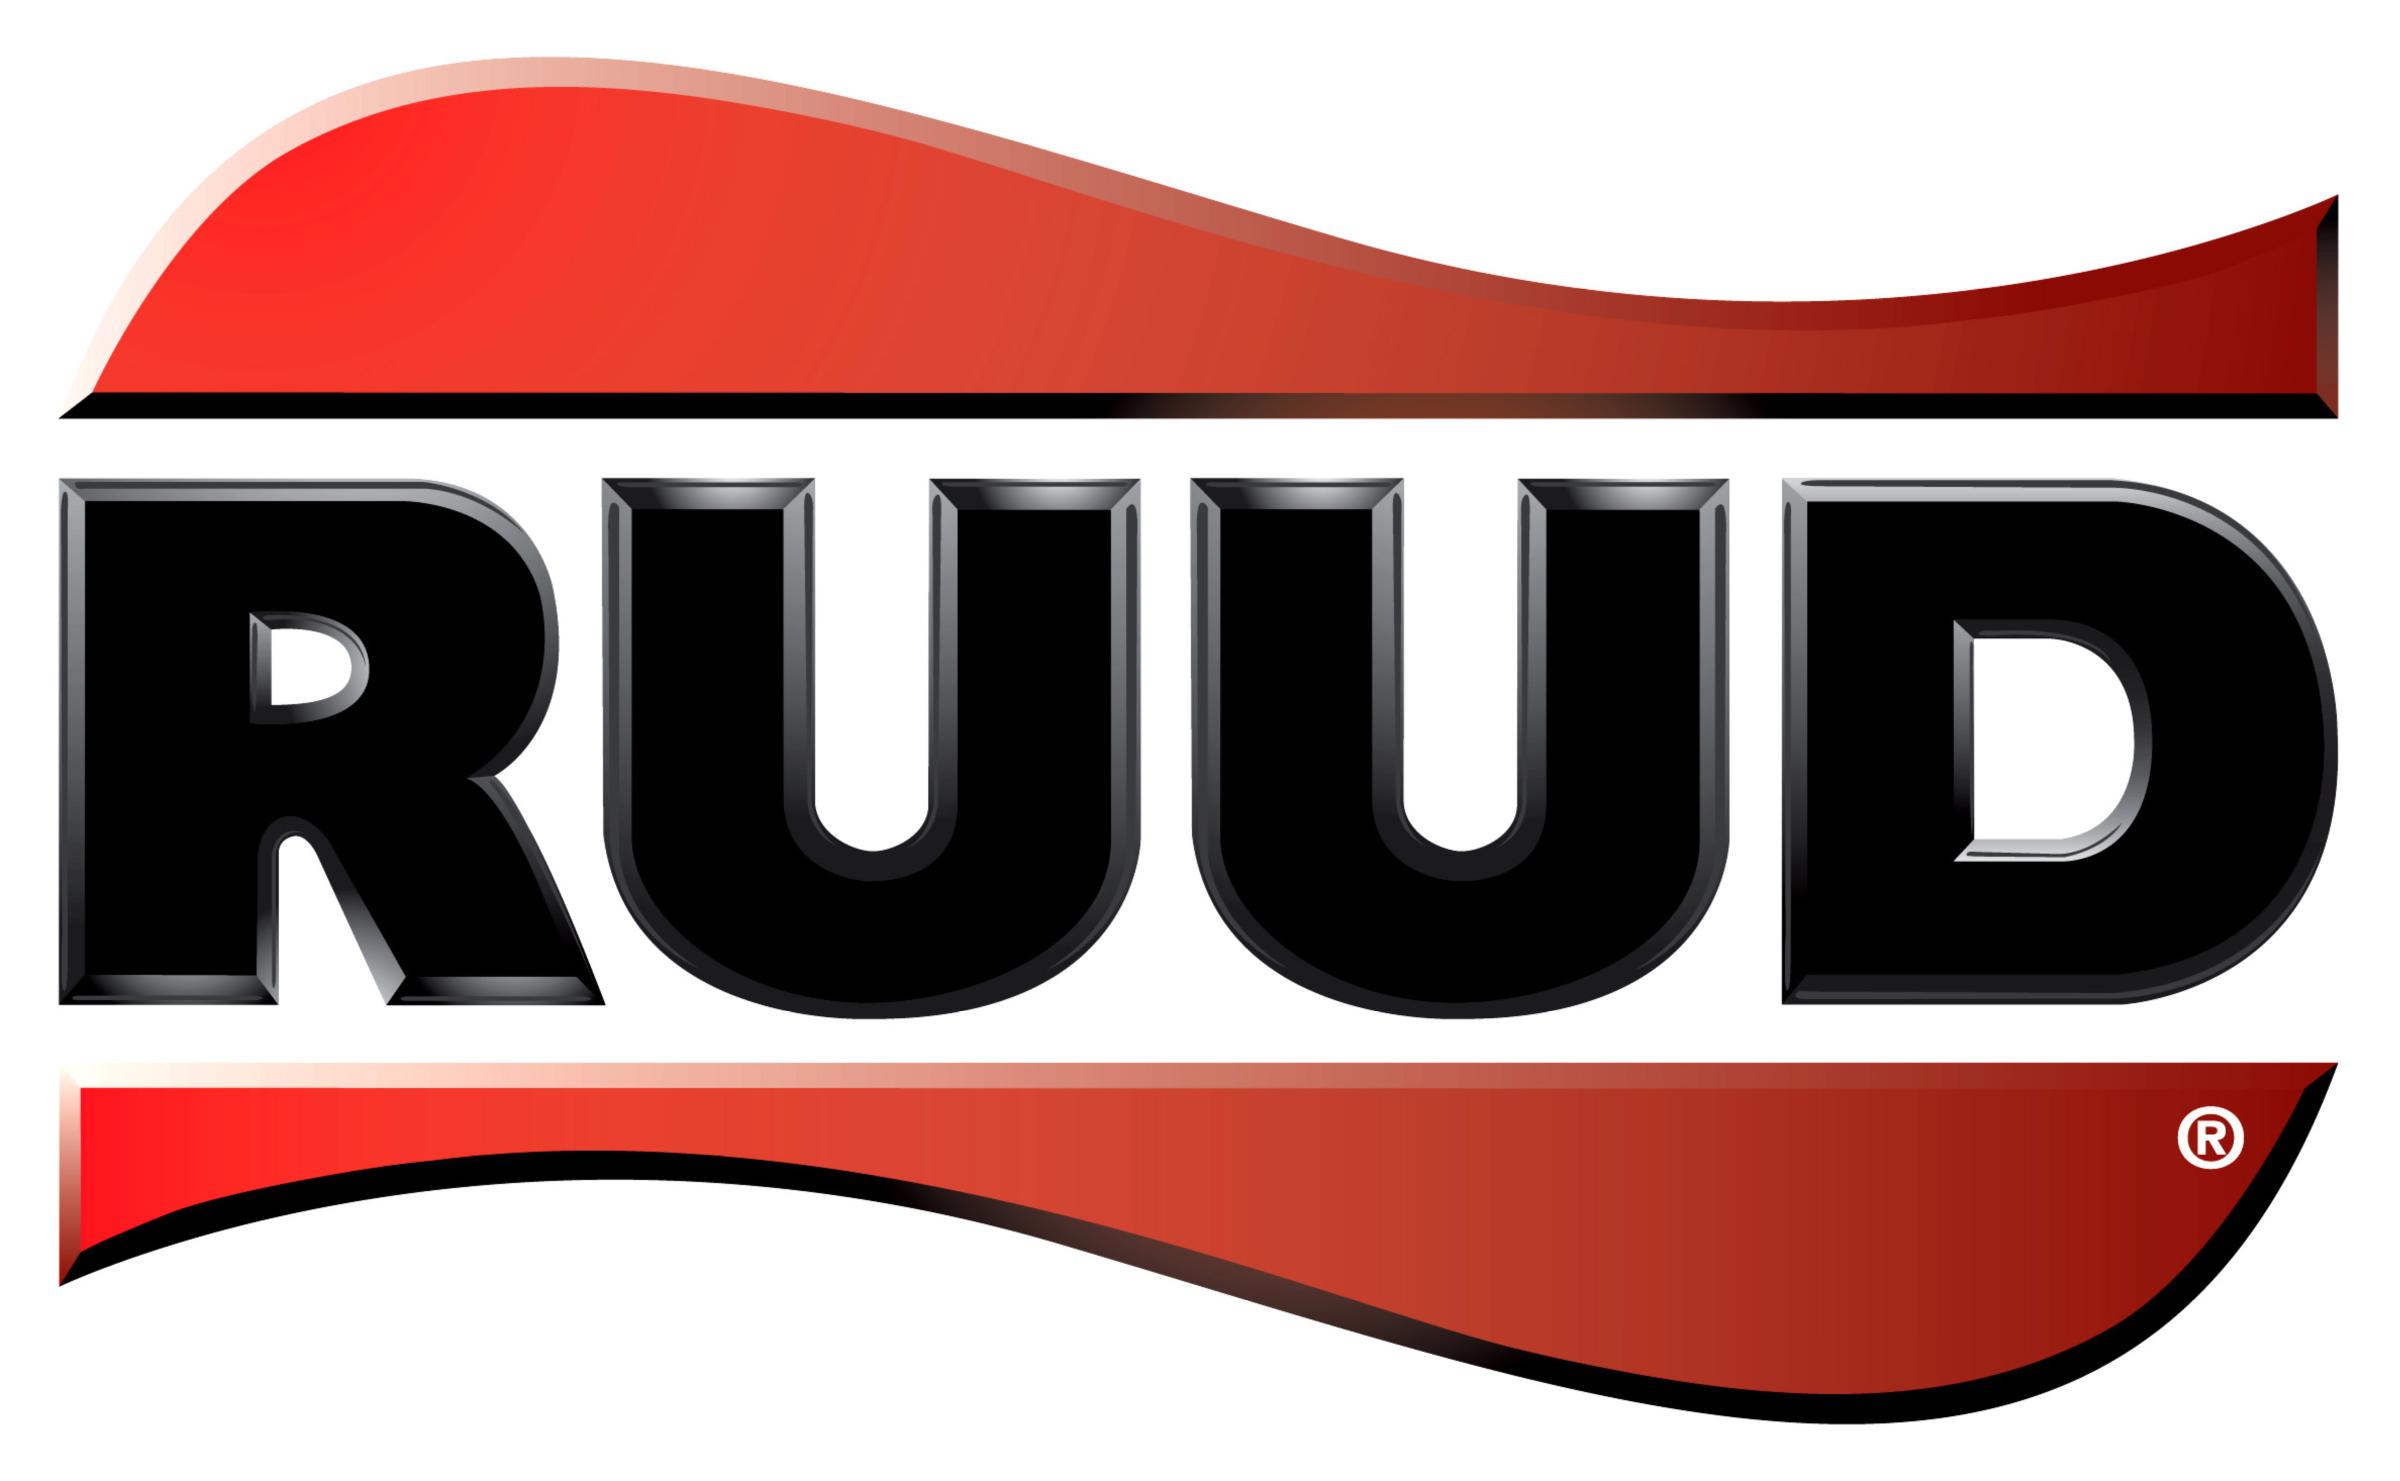 https://secureservercdn.net/198.71.233.129/zvi.7d3.myftpupload.com/wp-content/uploads/2019/11/ruud-logo.jpg